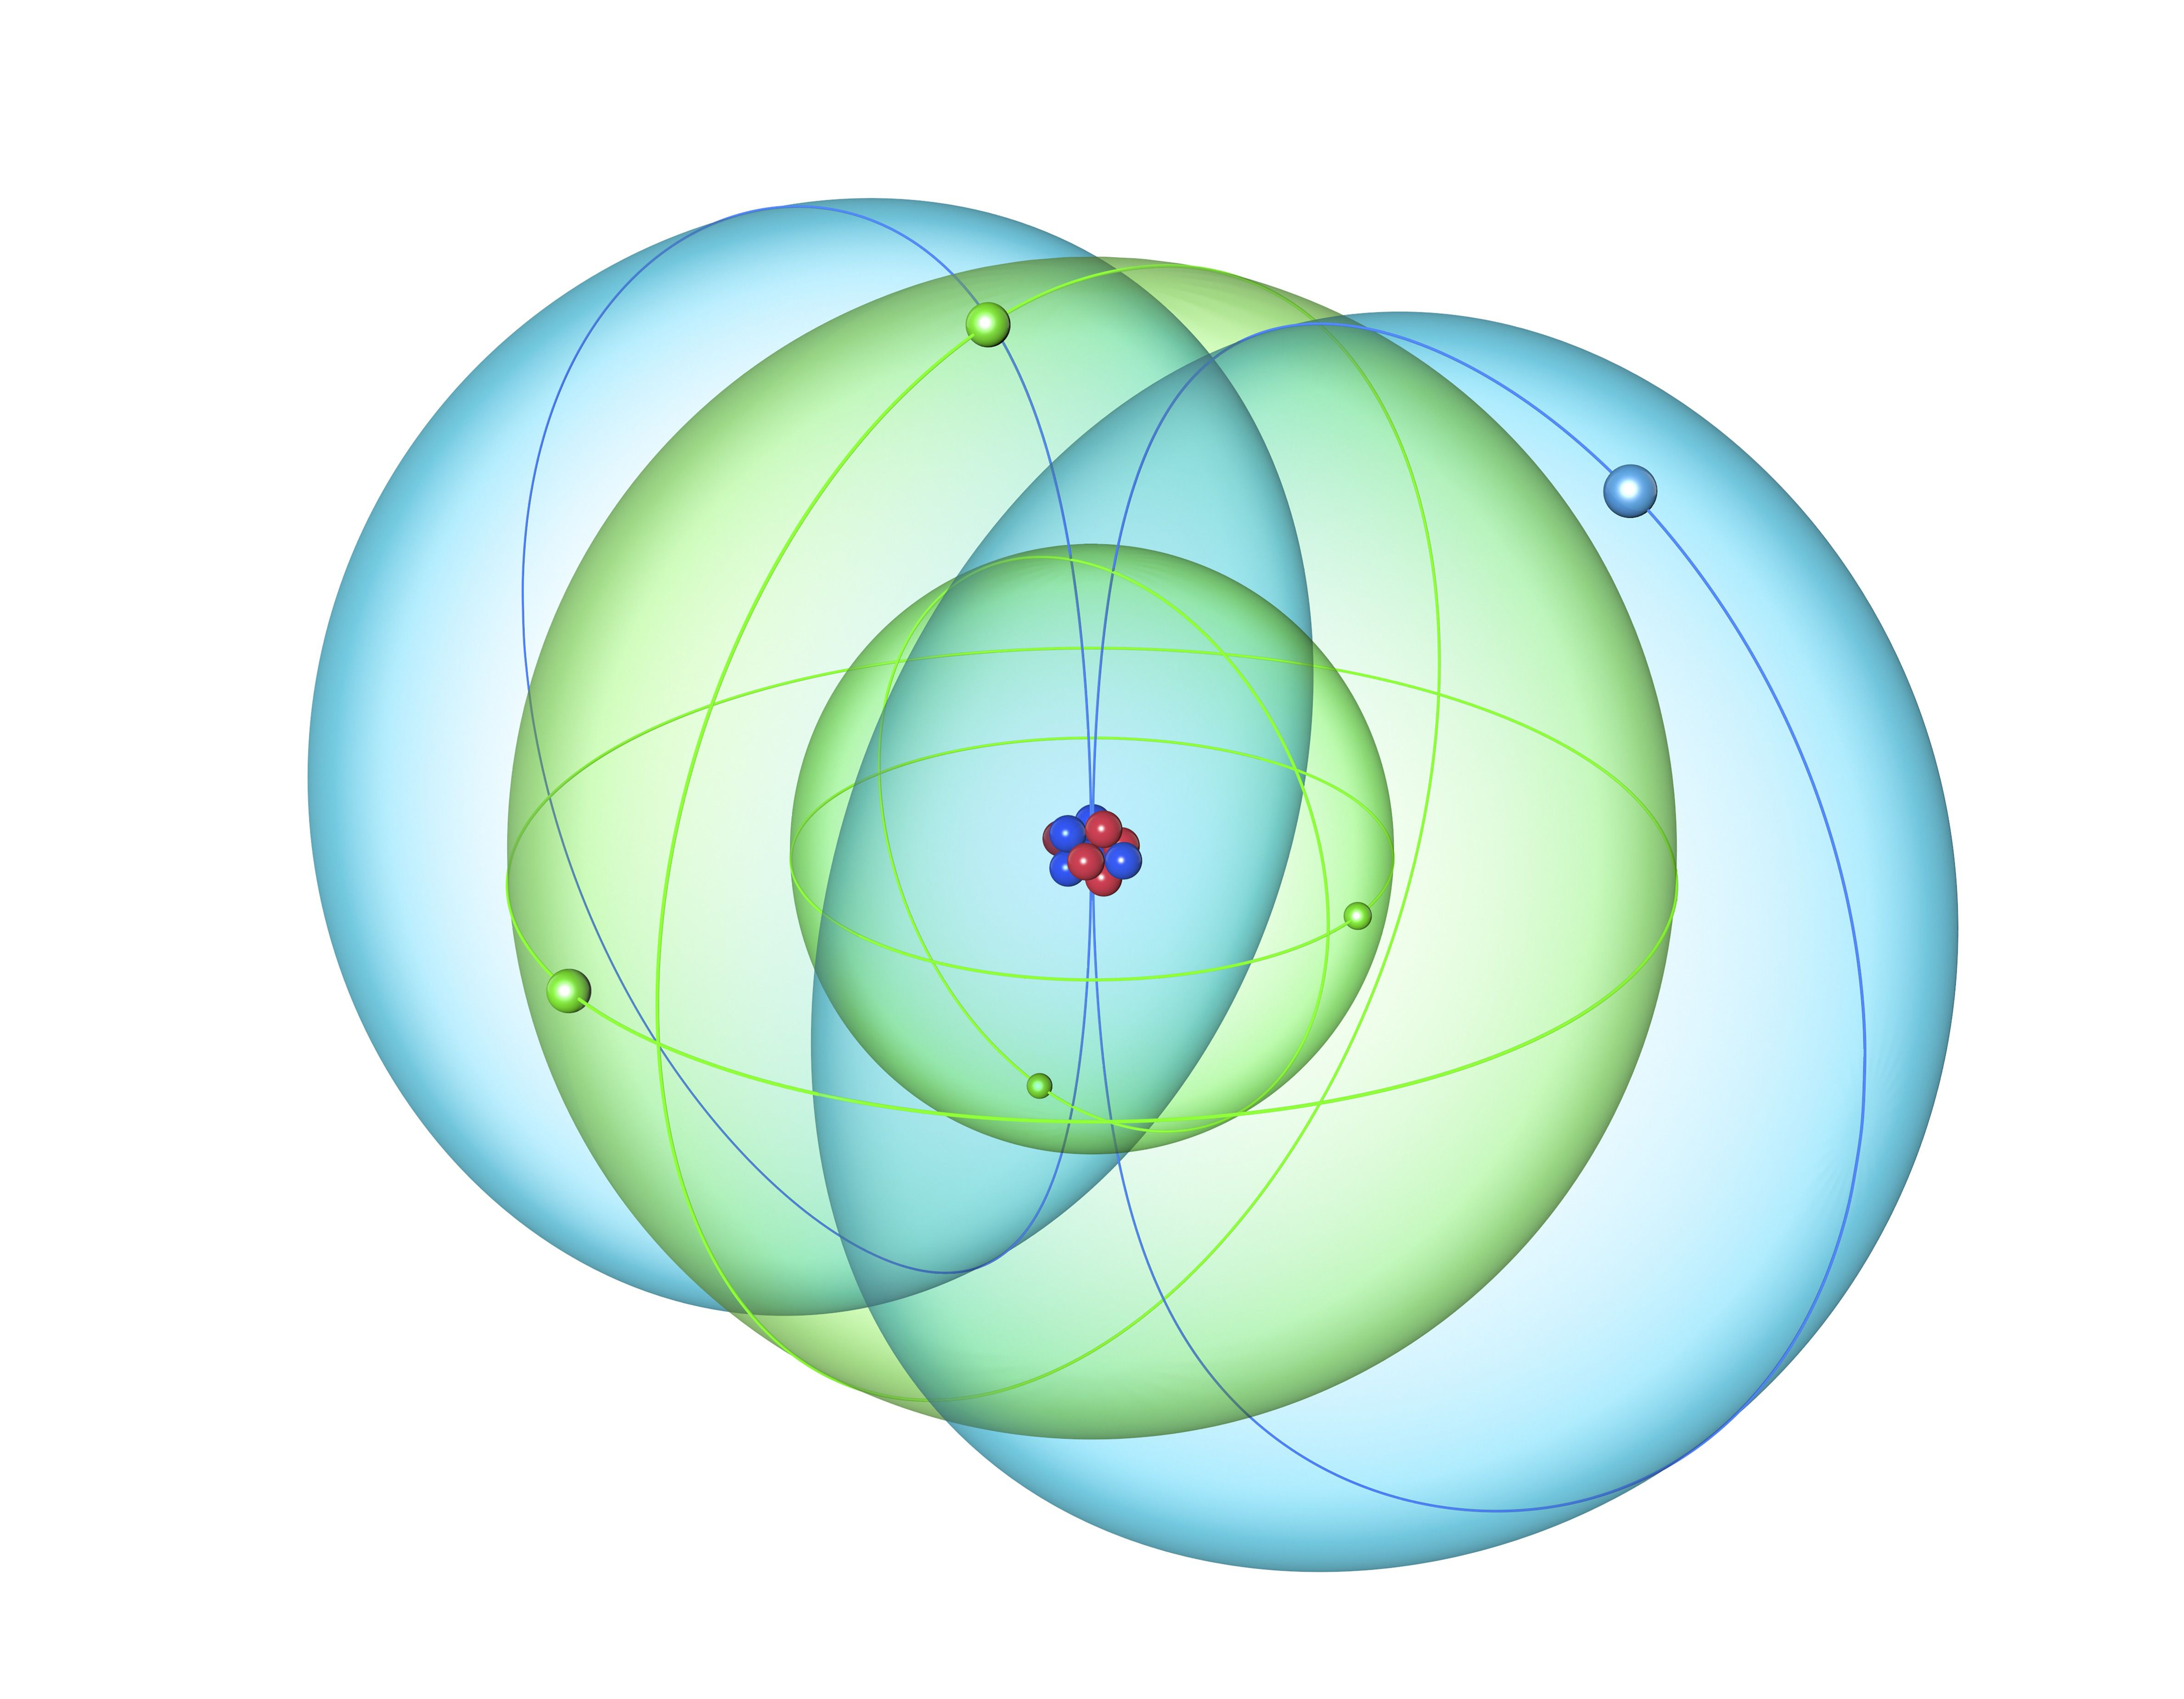 Atomic Mass From Atomic Abundance Chemistry Problem